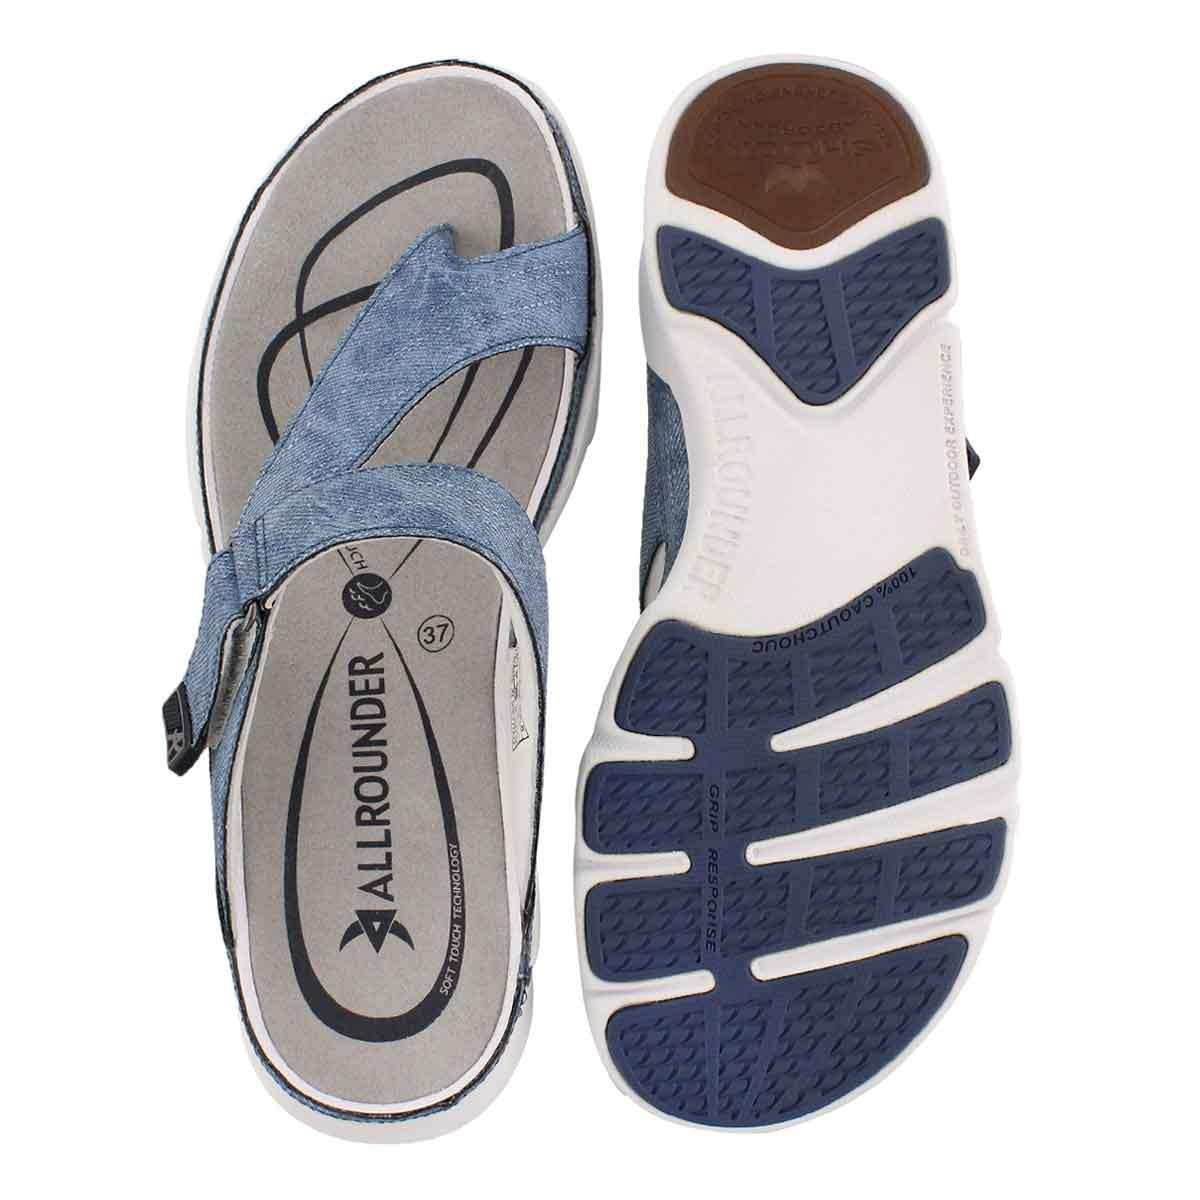 Lds Tokara jeans blue thong sandal